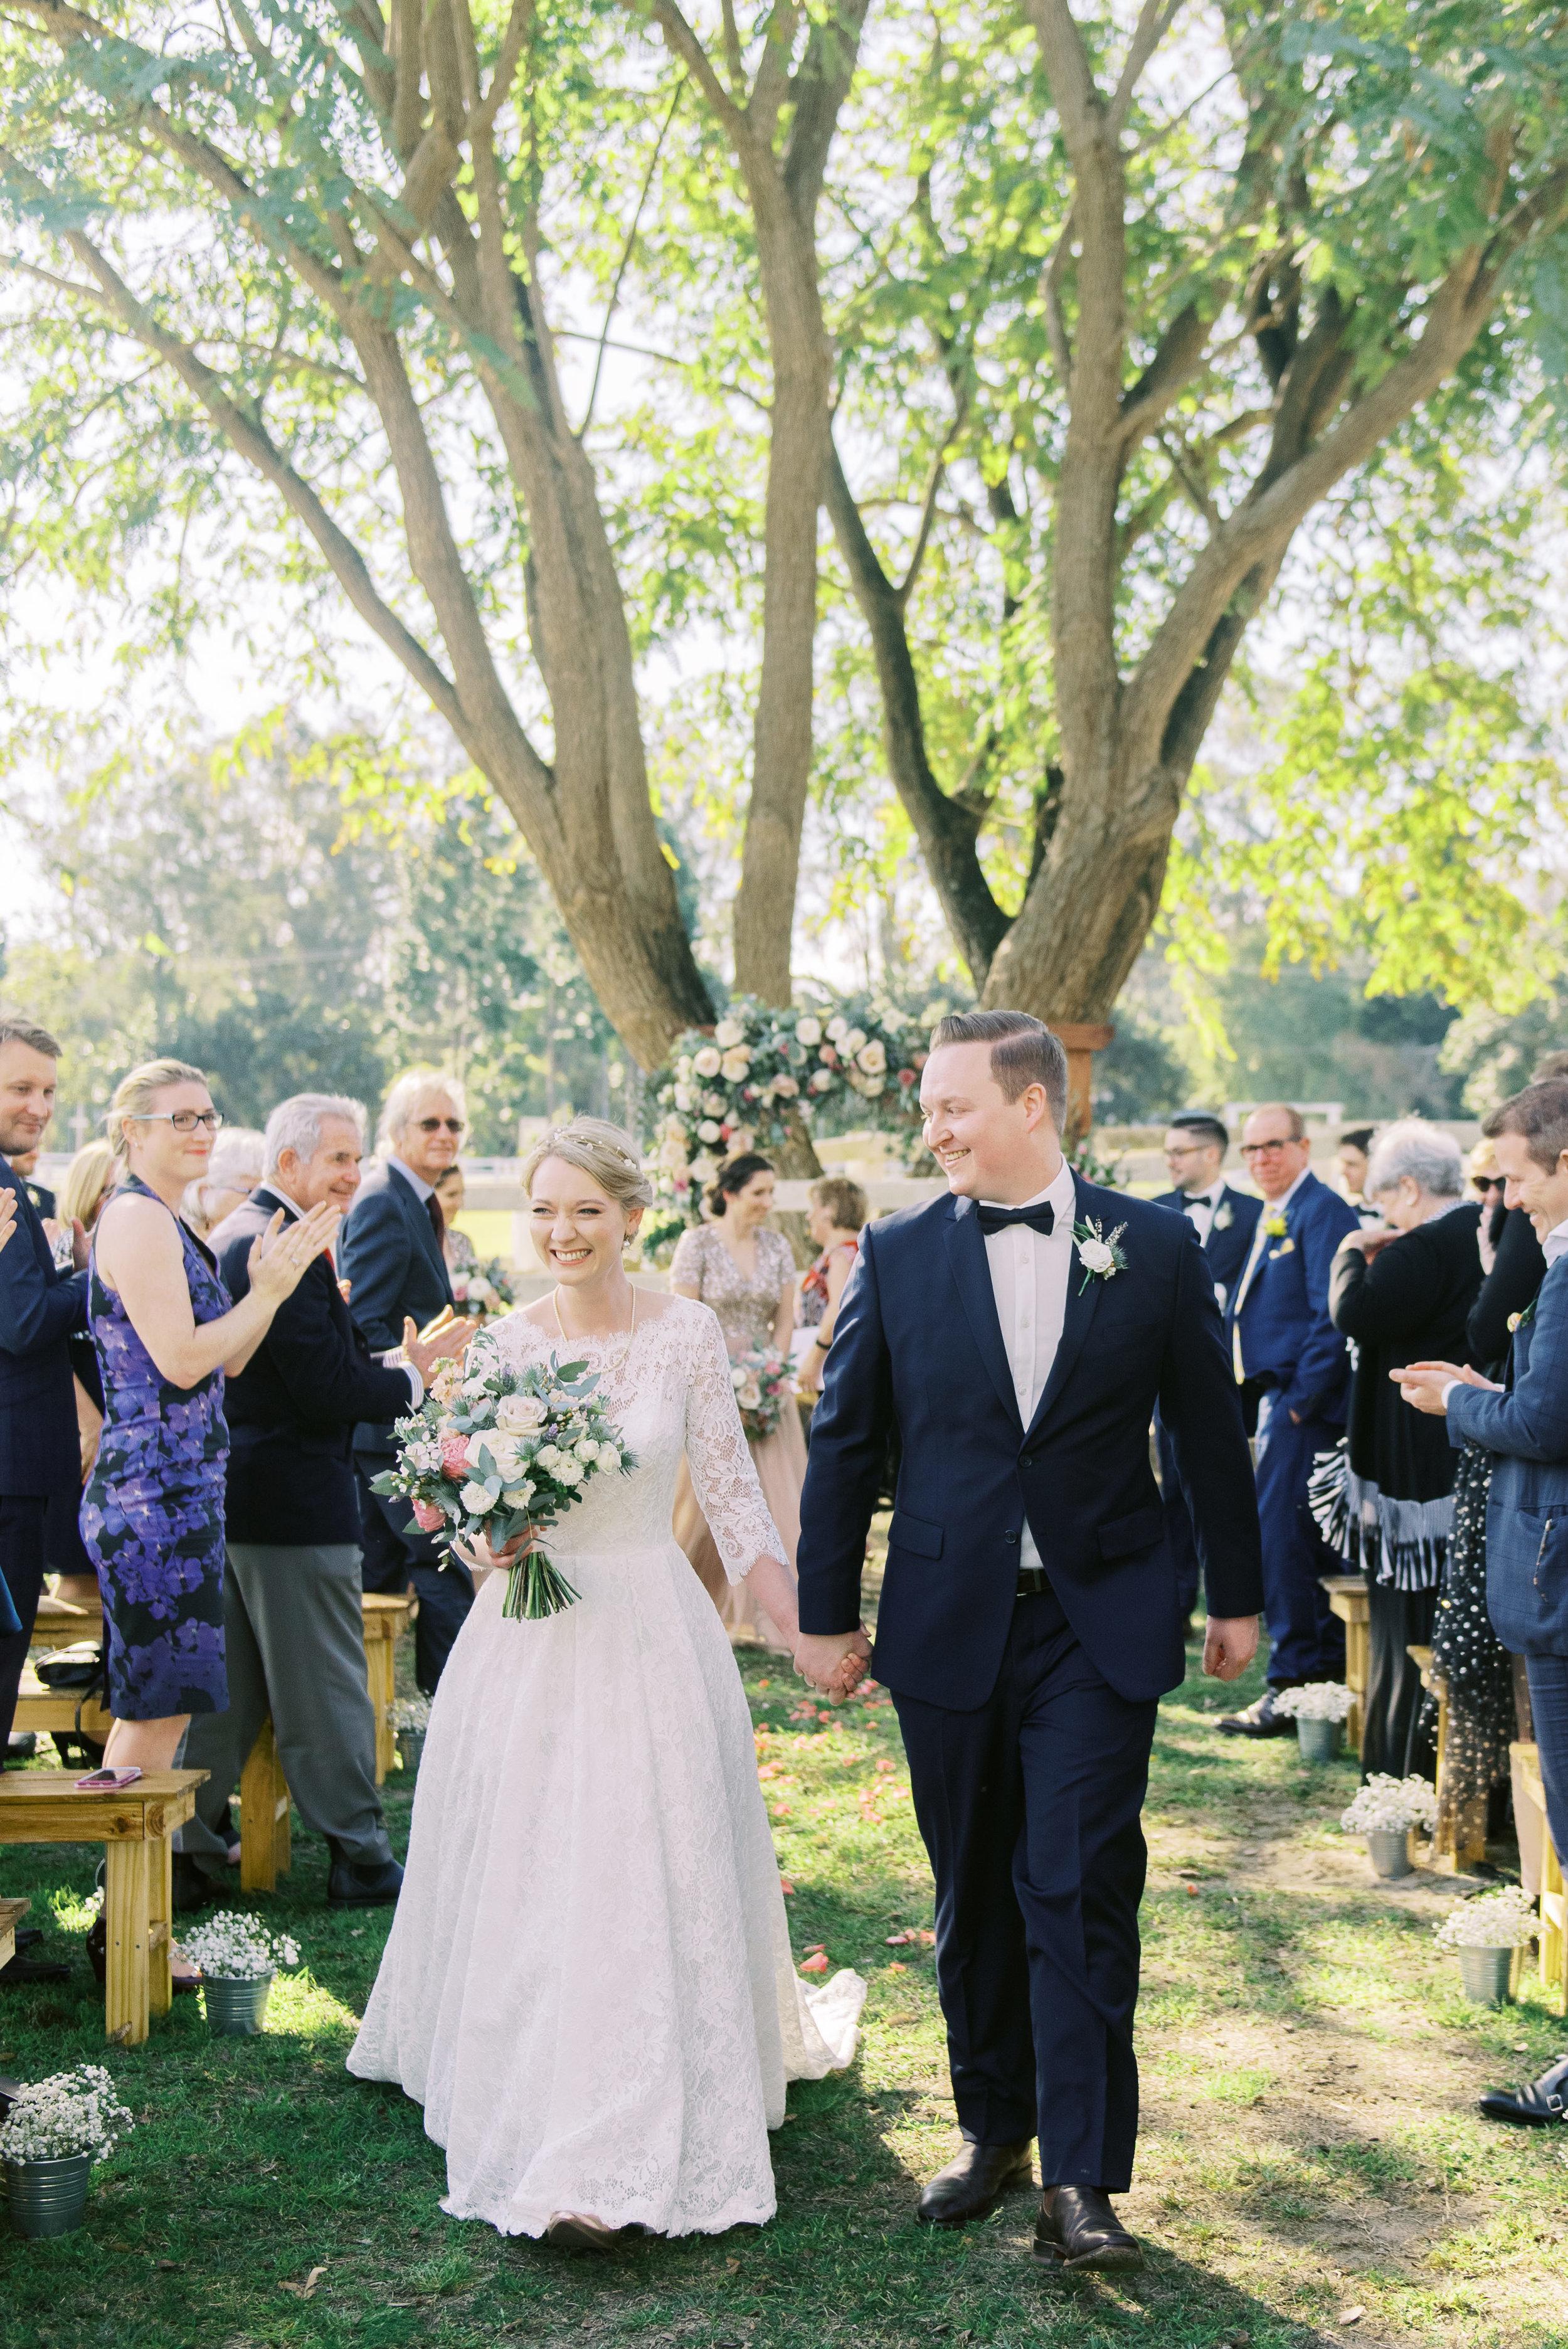 brisbane-gold-coast-sunshine-coast-tweed-romantic-fine-art-wedding-photography-lauren-olivia-31.jpg